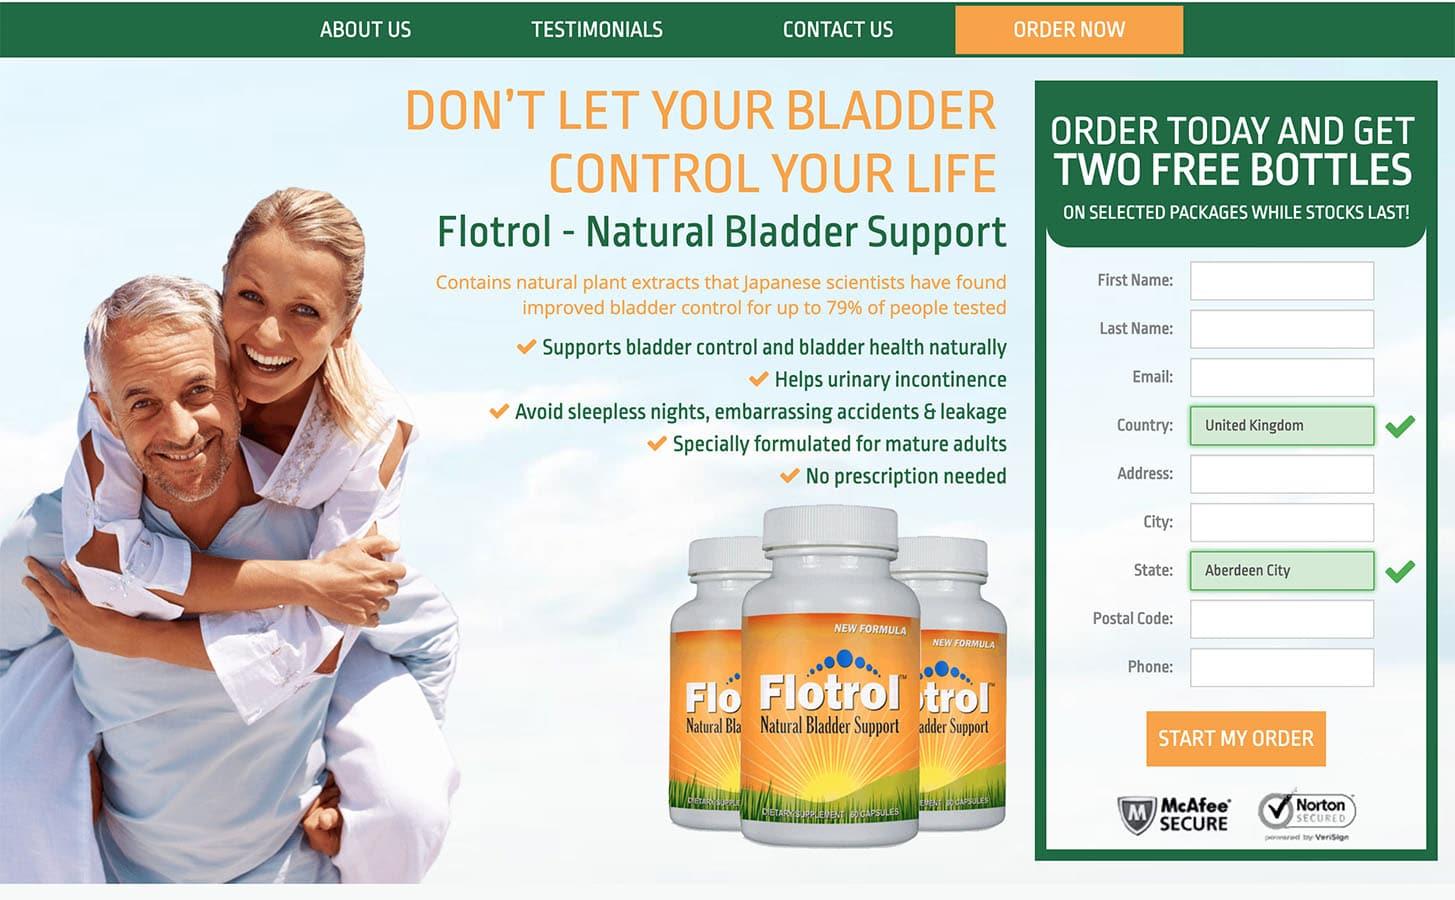 flotrol uk, ireland website